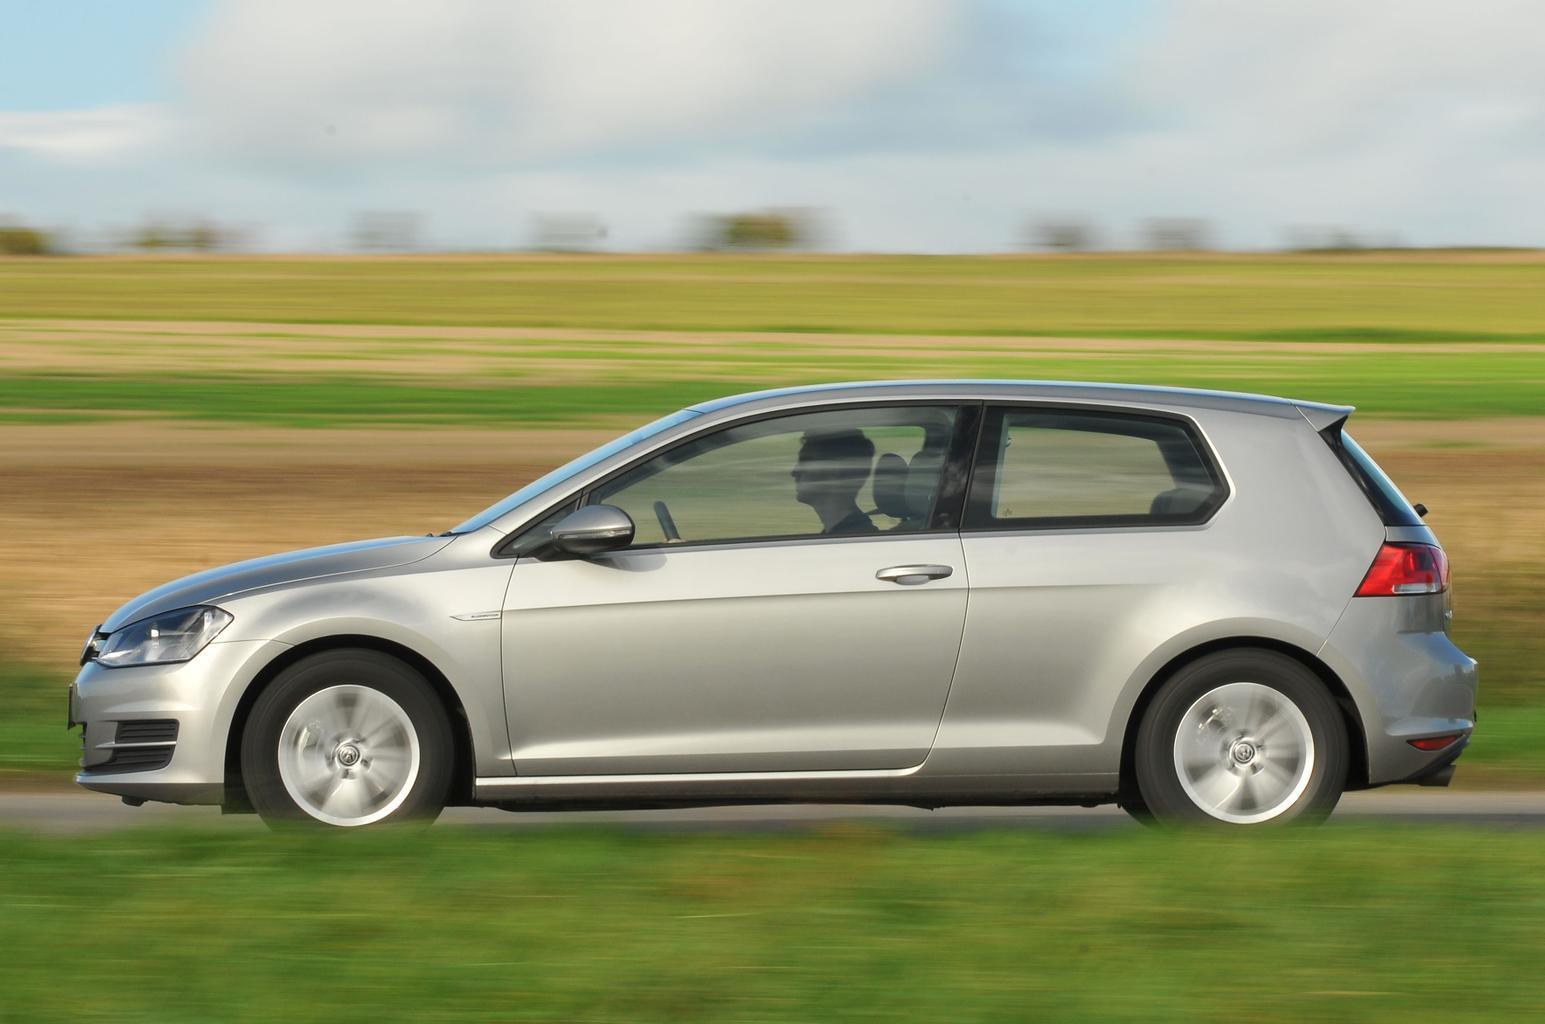 Used Volkswagen Golf hatchback (13 - present)